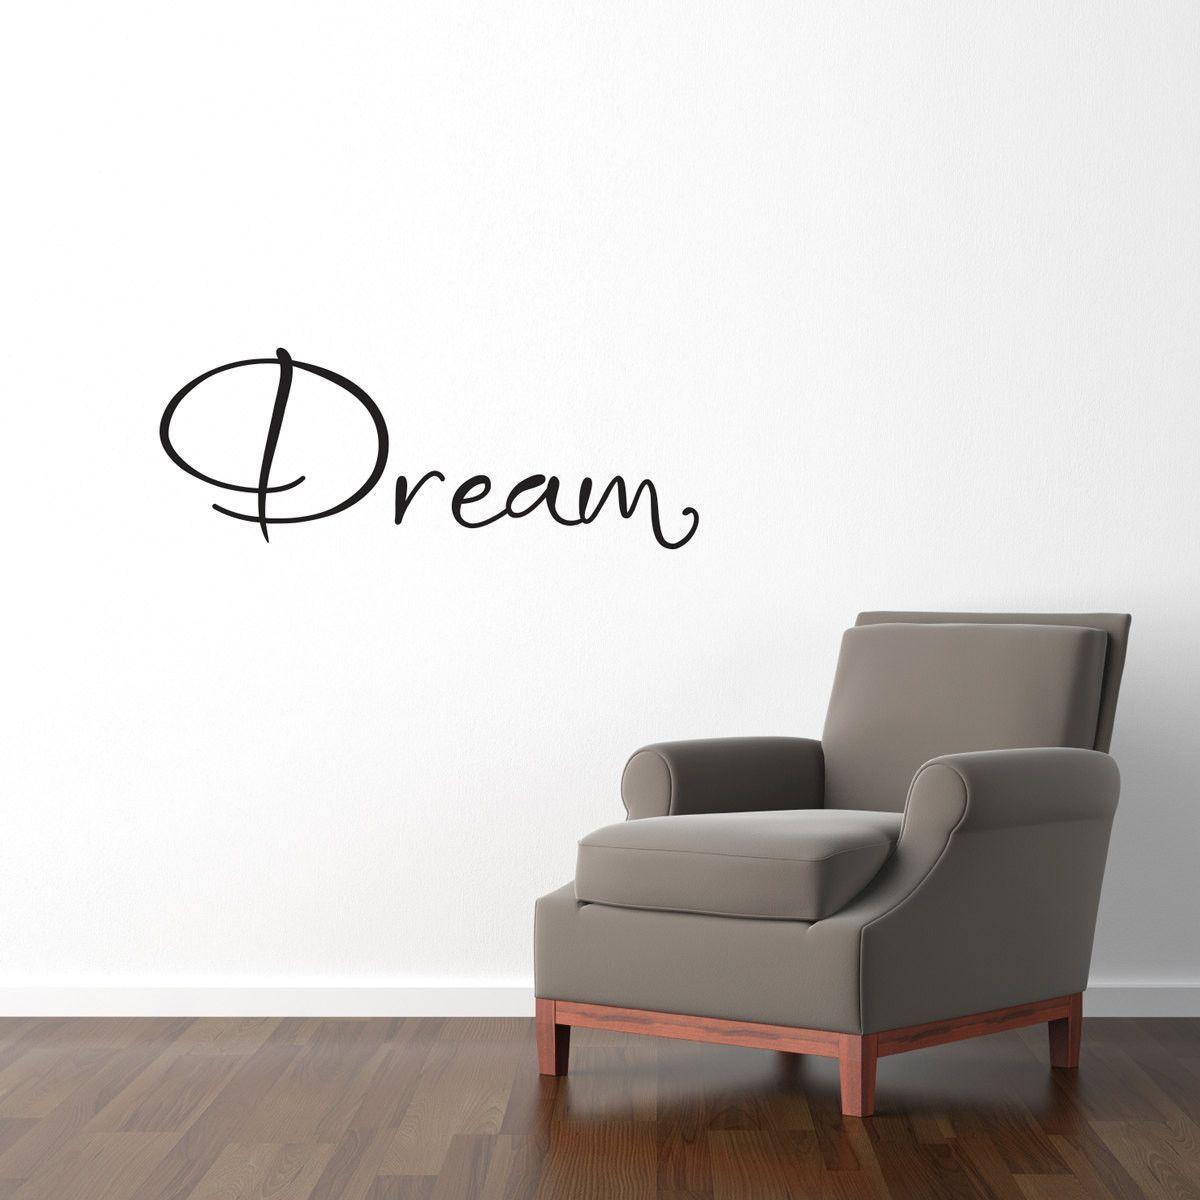 Dream Wall Decal - Medium